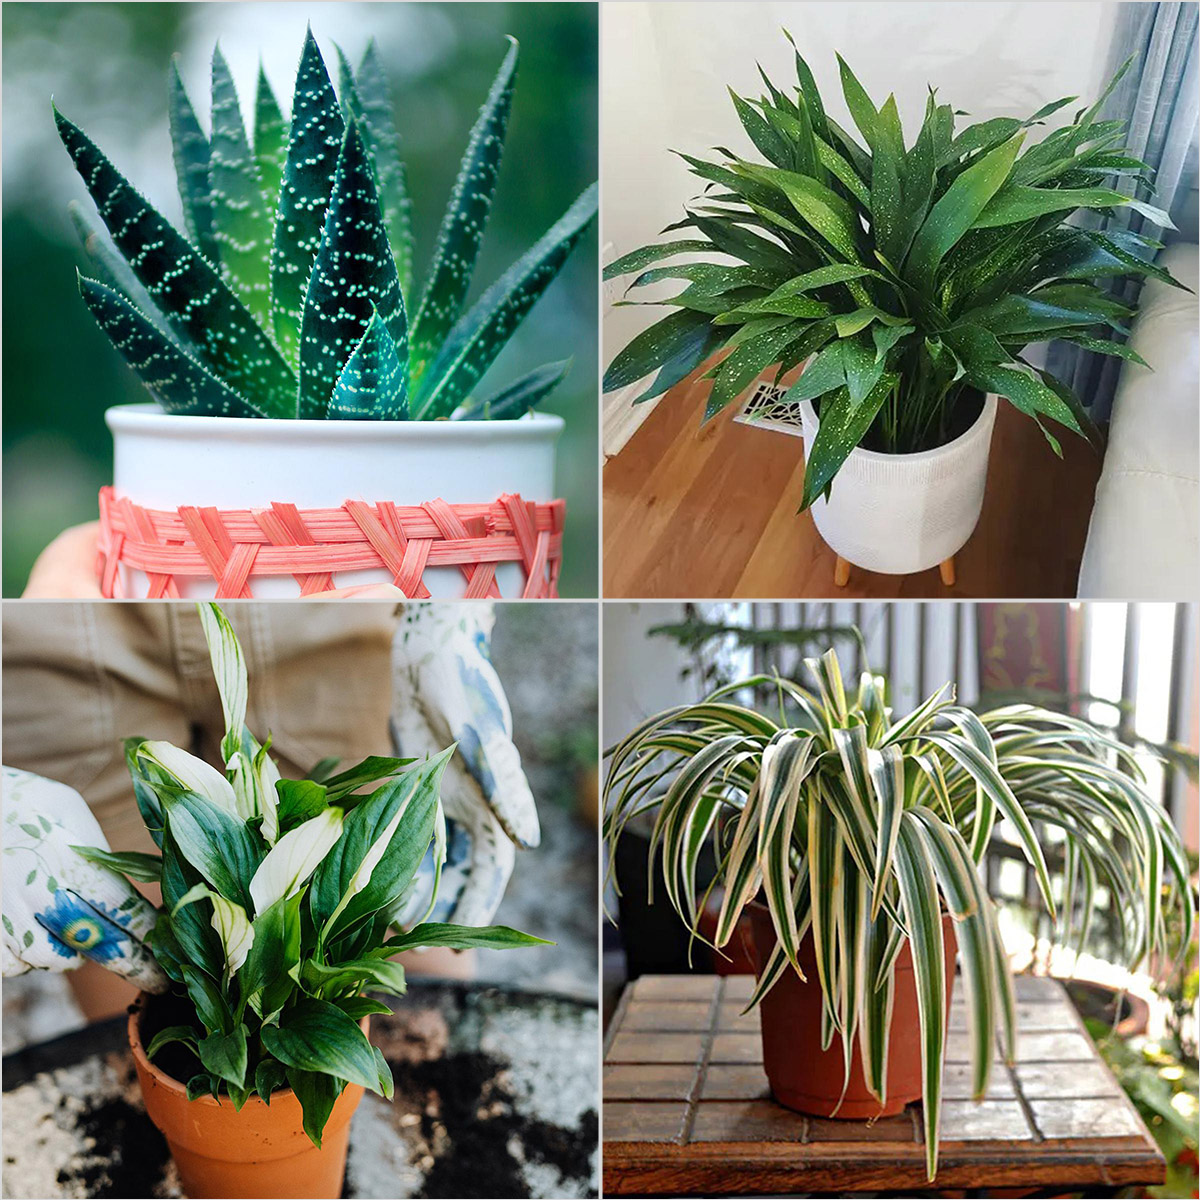 Top 10 Plants Ideas for Your Bathroom